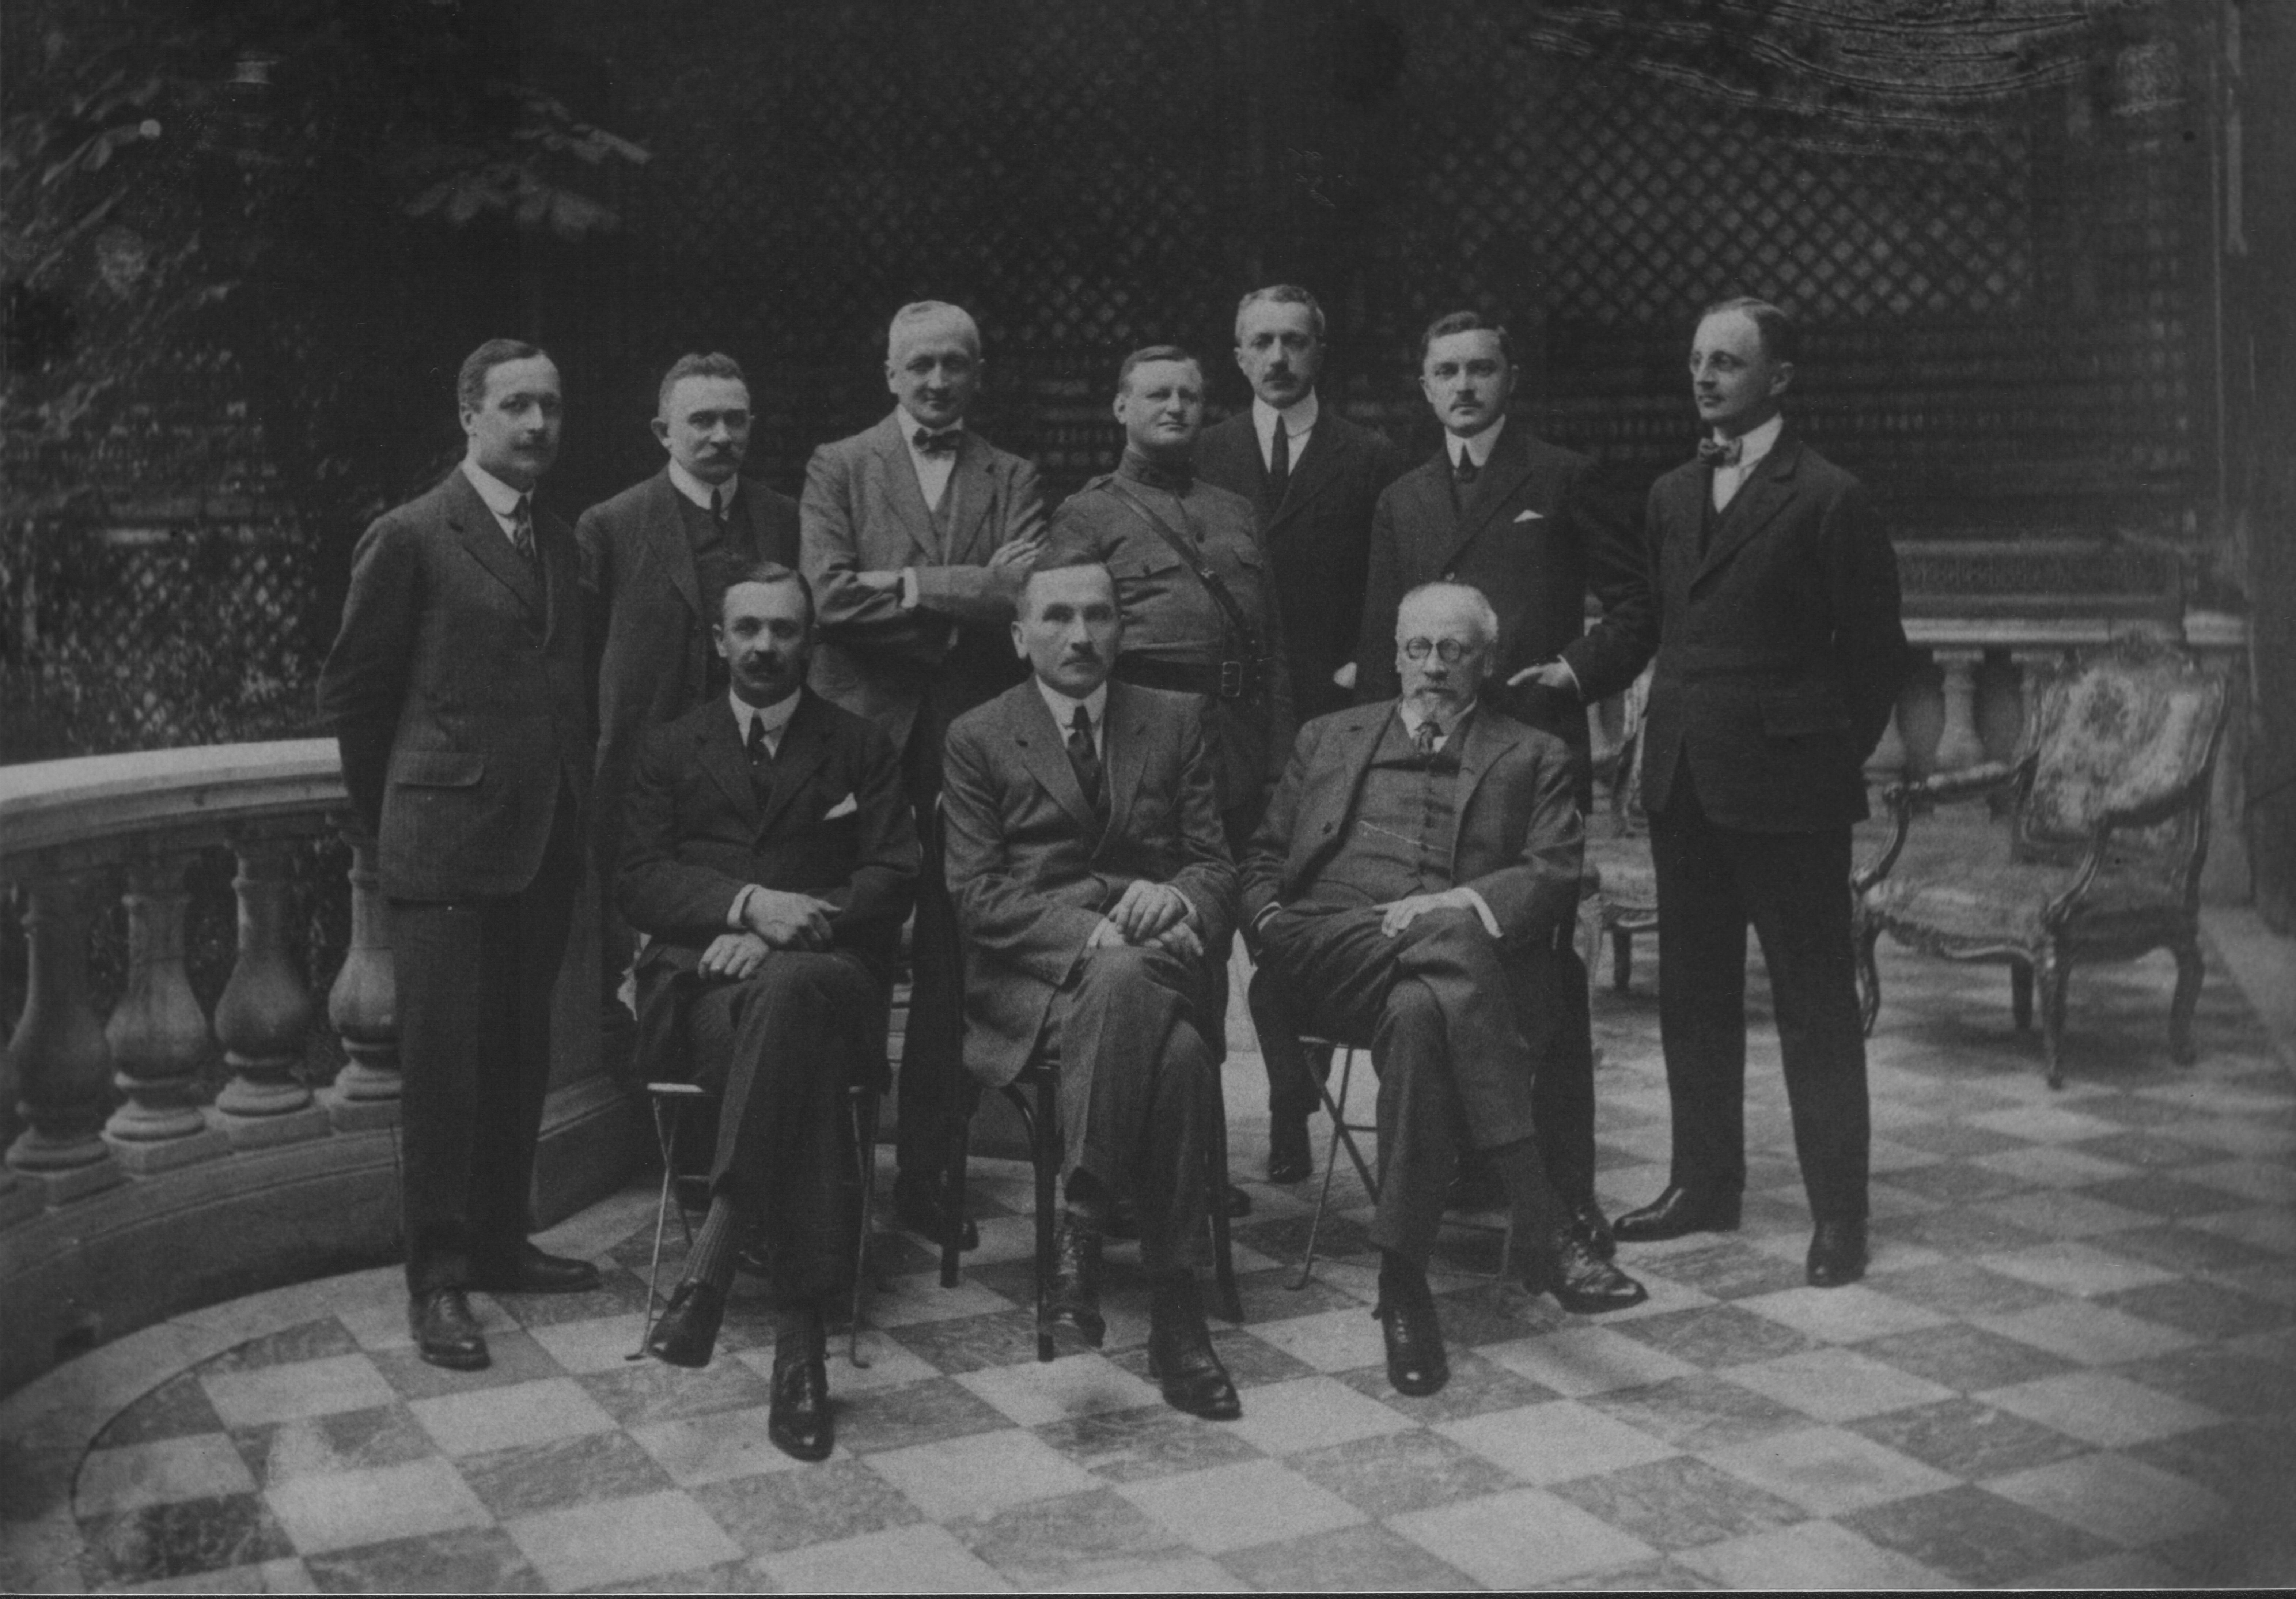 0 1919 Komitet Narodowy Polski